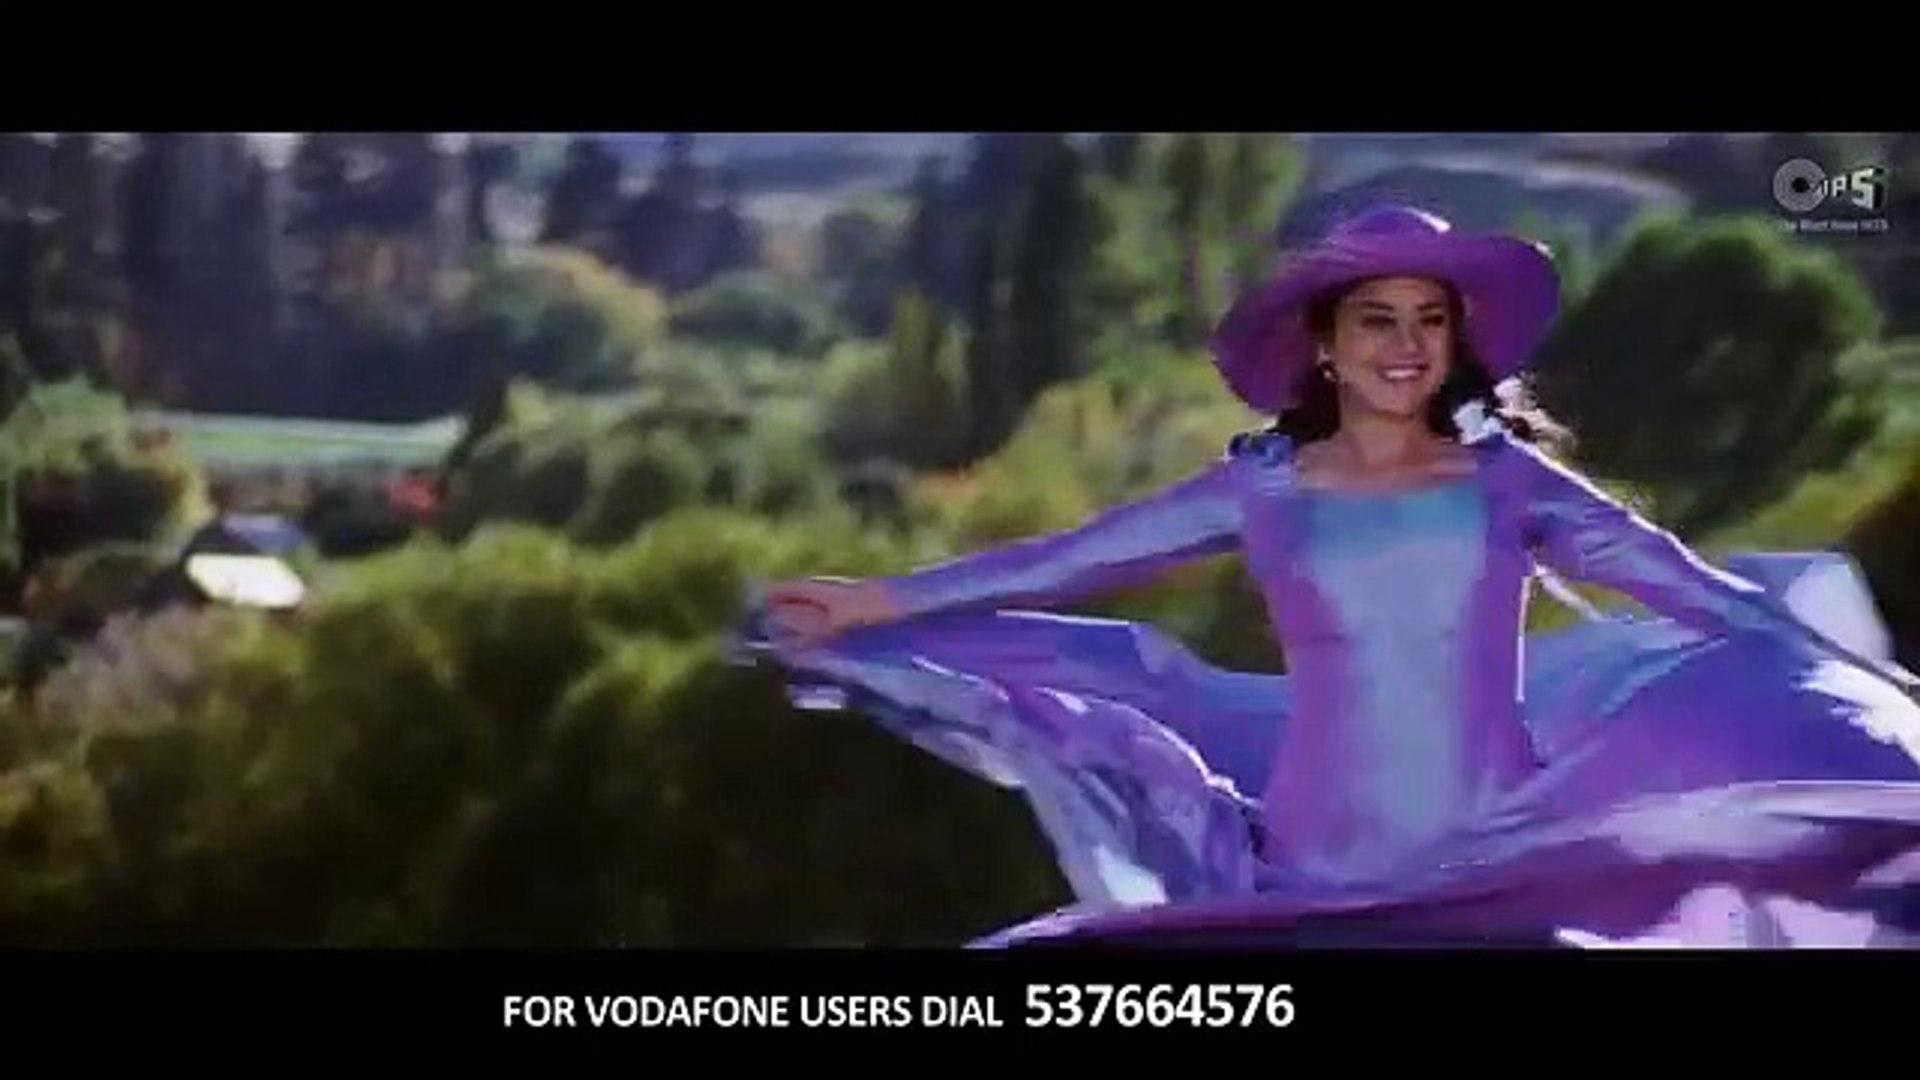 Soldier Soldier Full Video - Soldier - Bobby Deol & Preity Zinta - Kumar Sanu